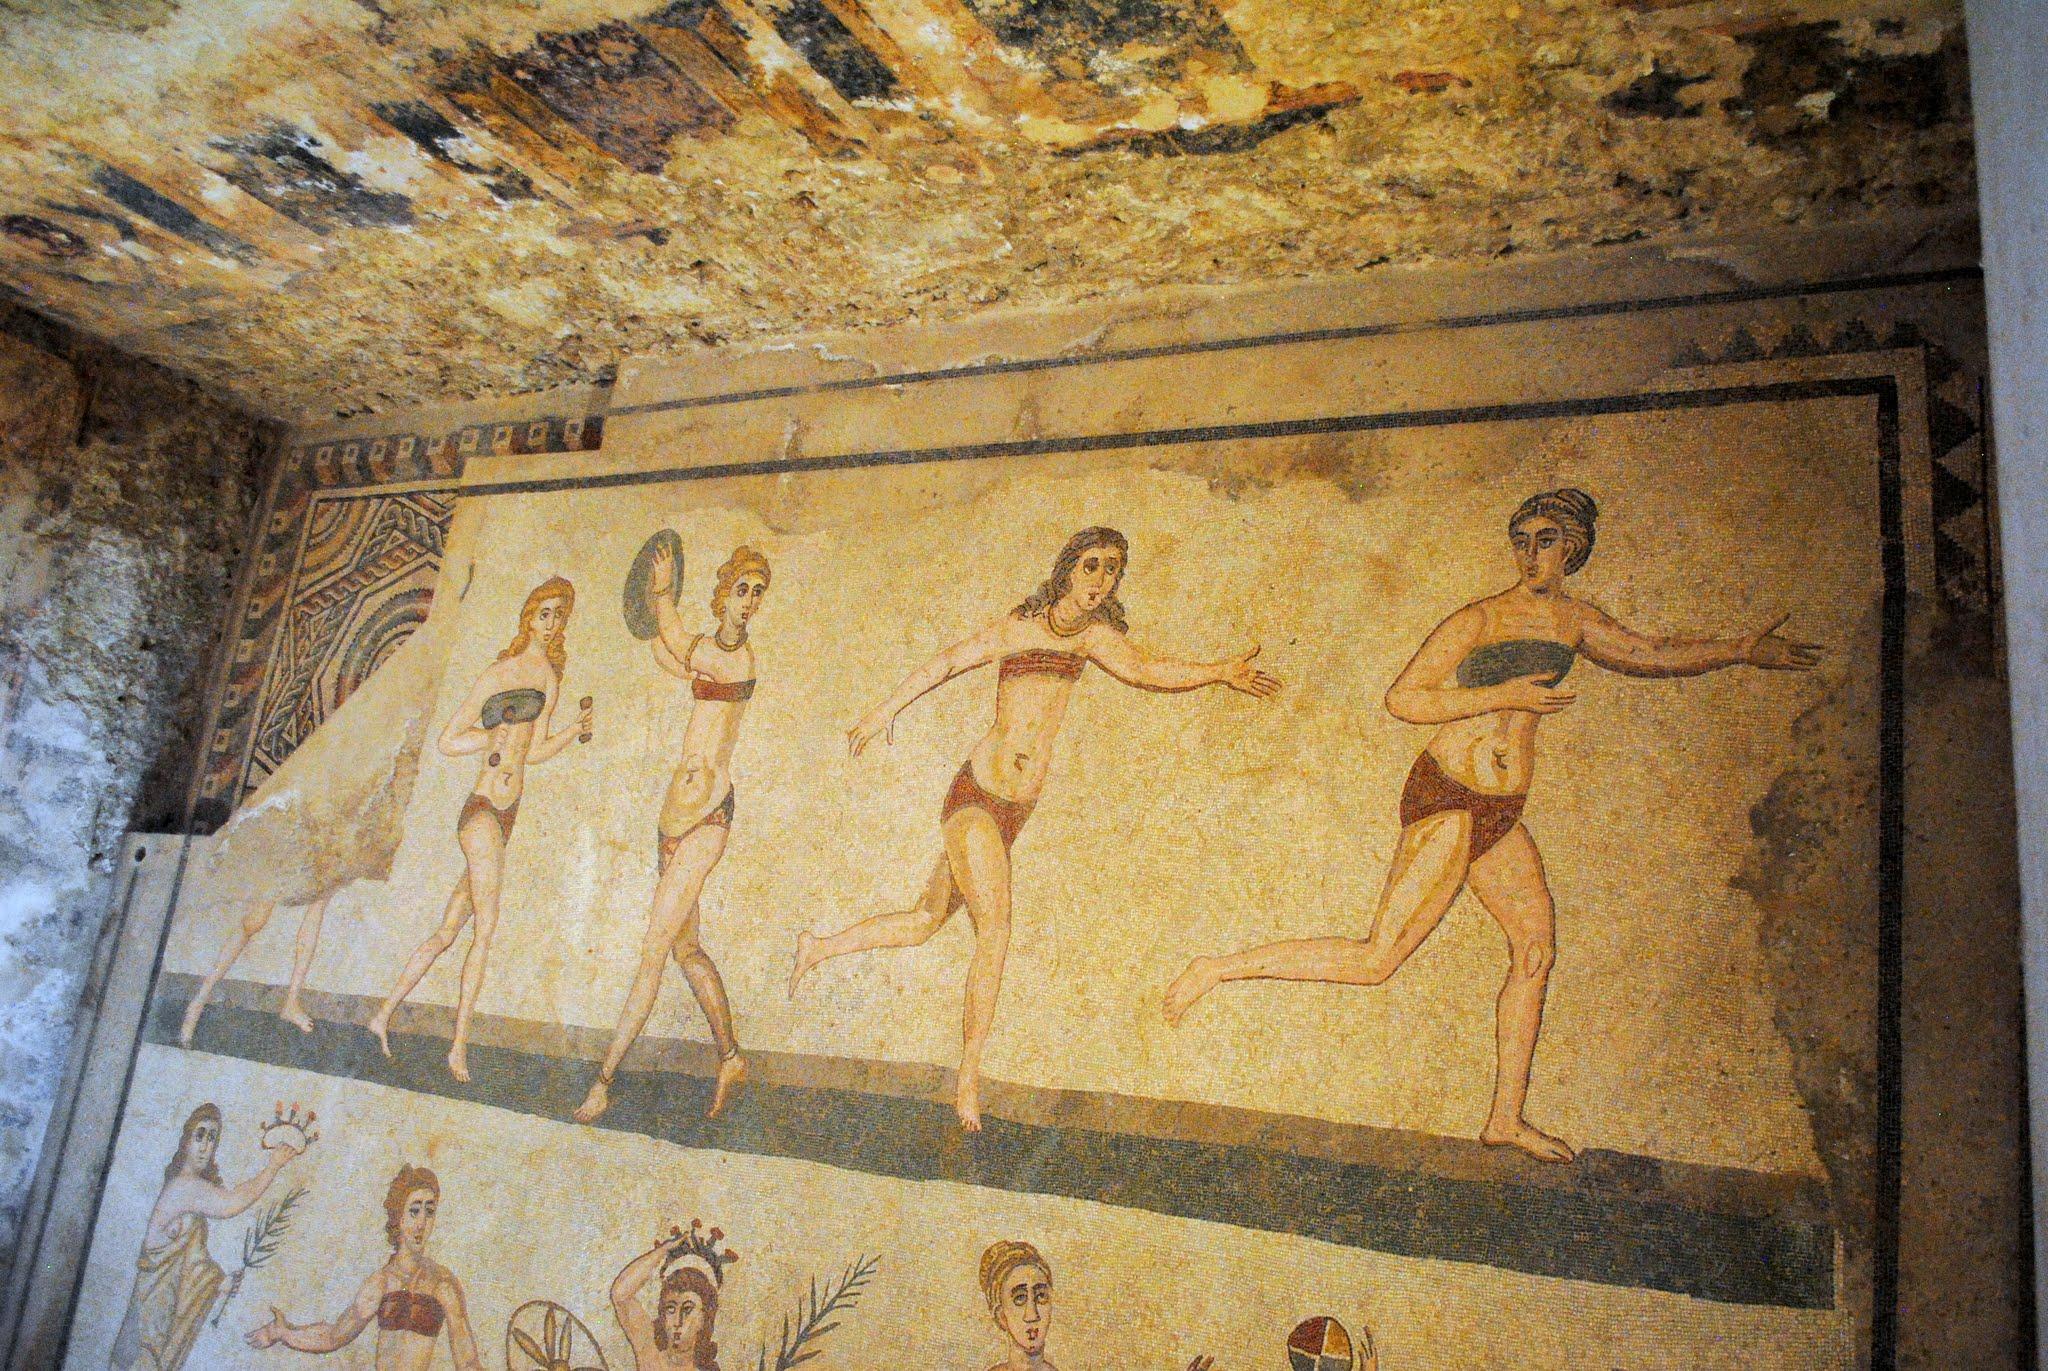 My Photos: Italy -- Mosaics -- Sicily -- Piazza Armerina -- The Mosaic of Ten Girls Wearing Bikinis